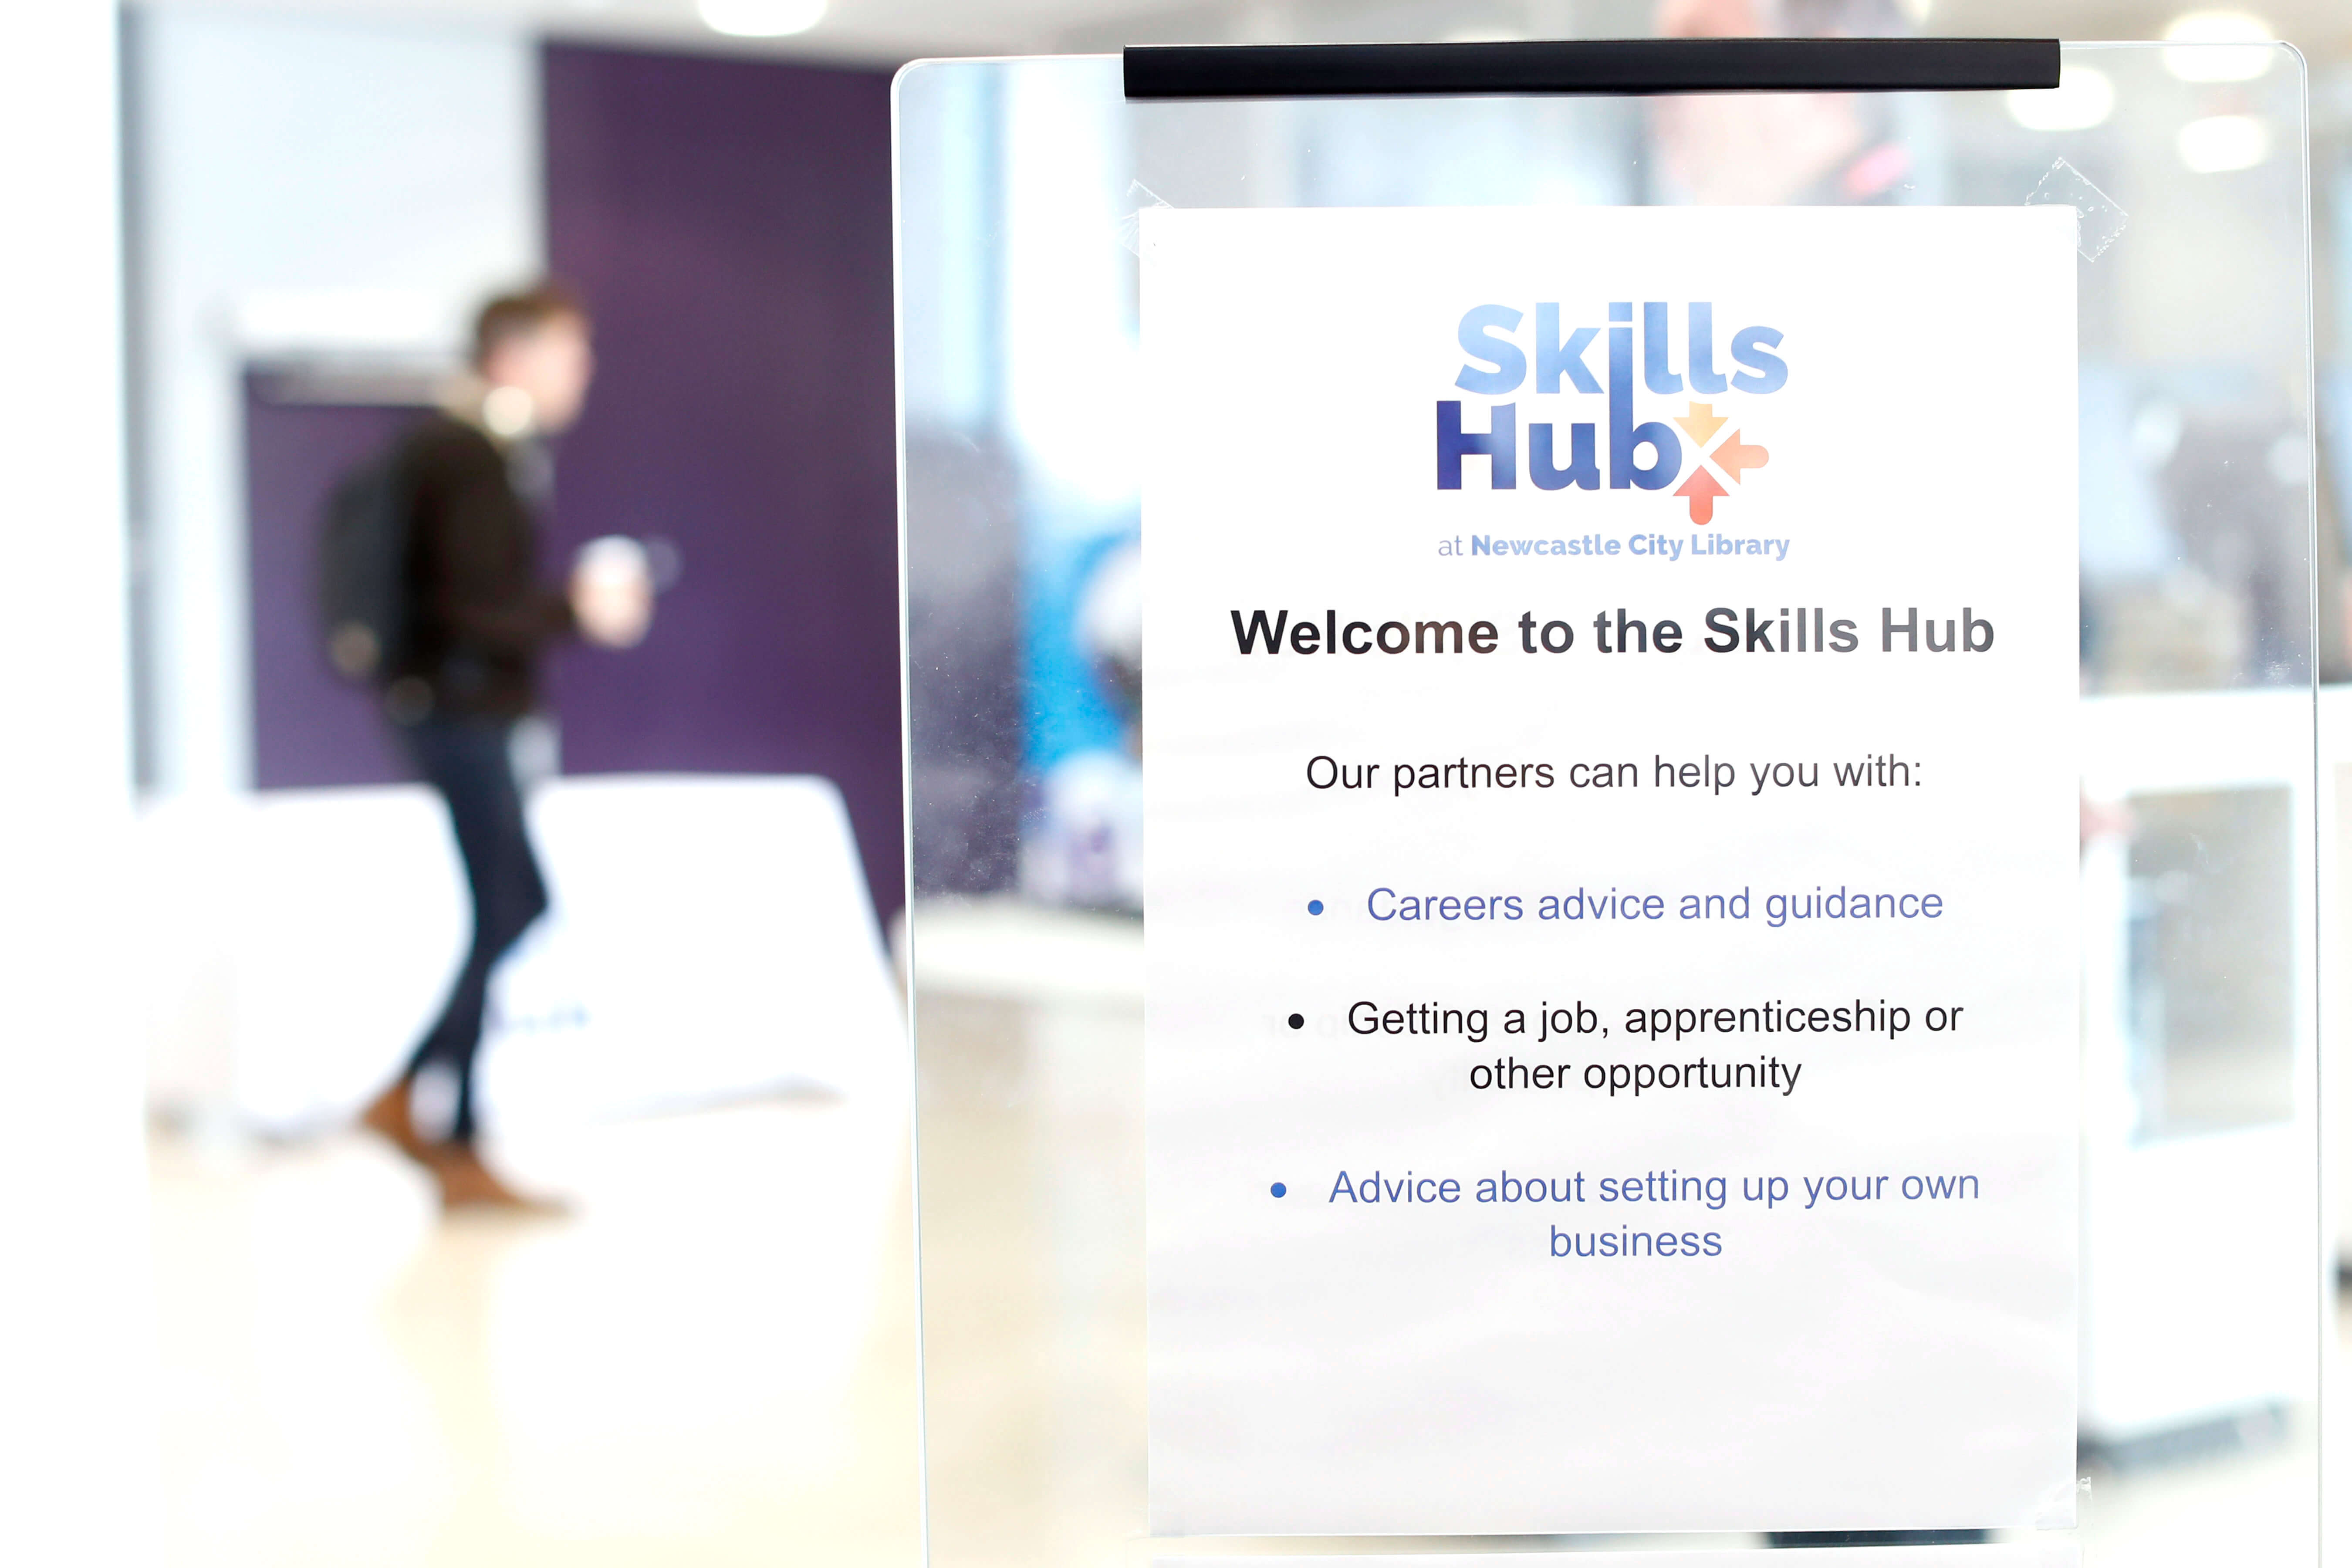 skills hub office